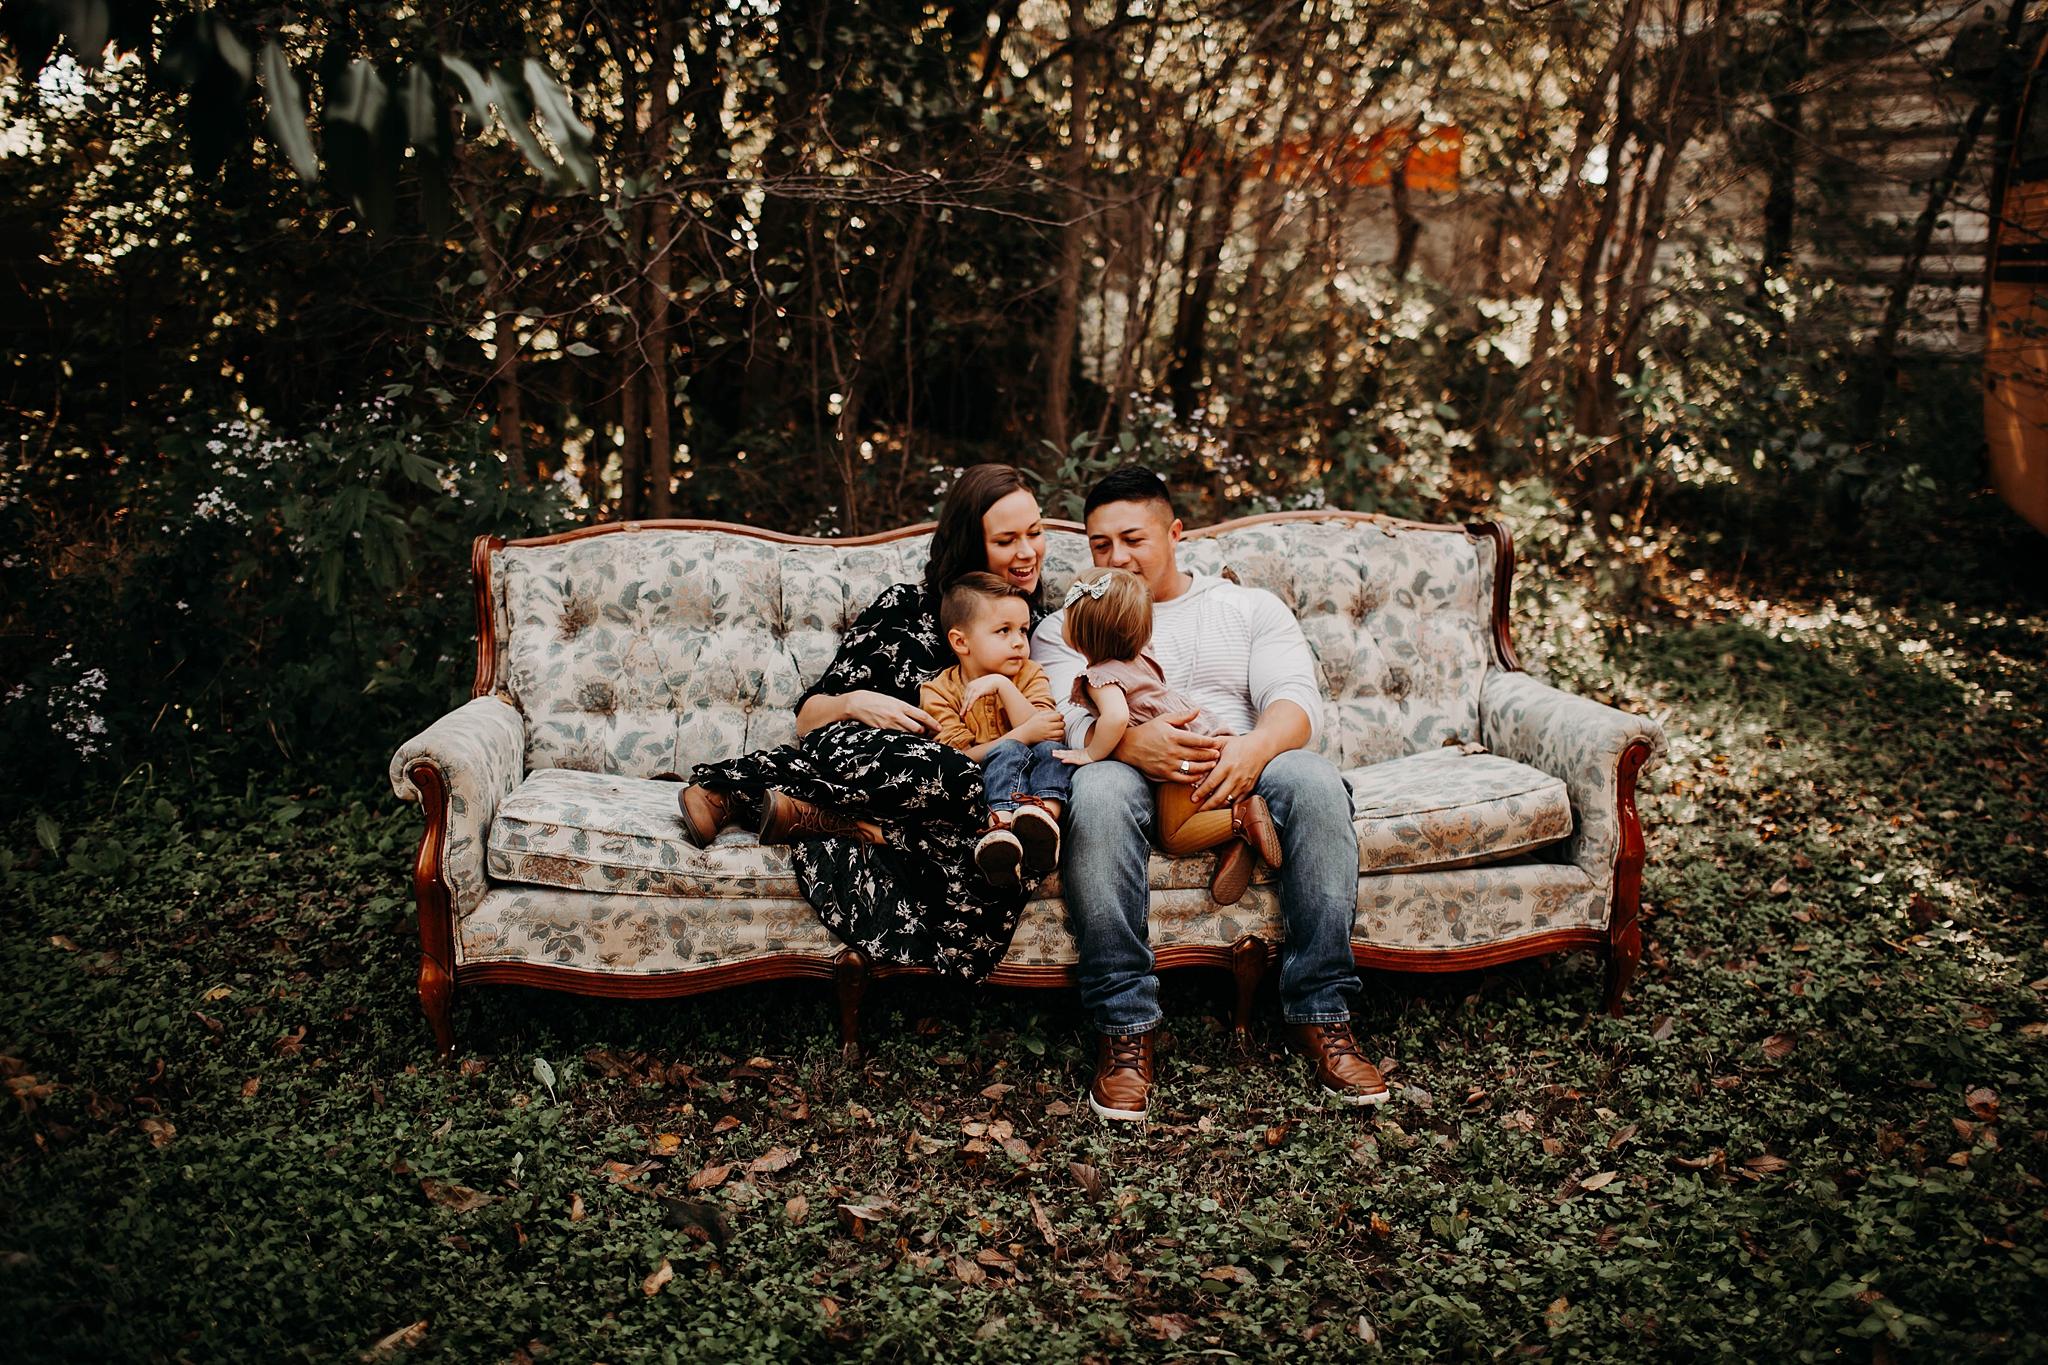 Luera-VMP-San-Antonio-Family-Photography-49_WEB.jpg